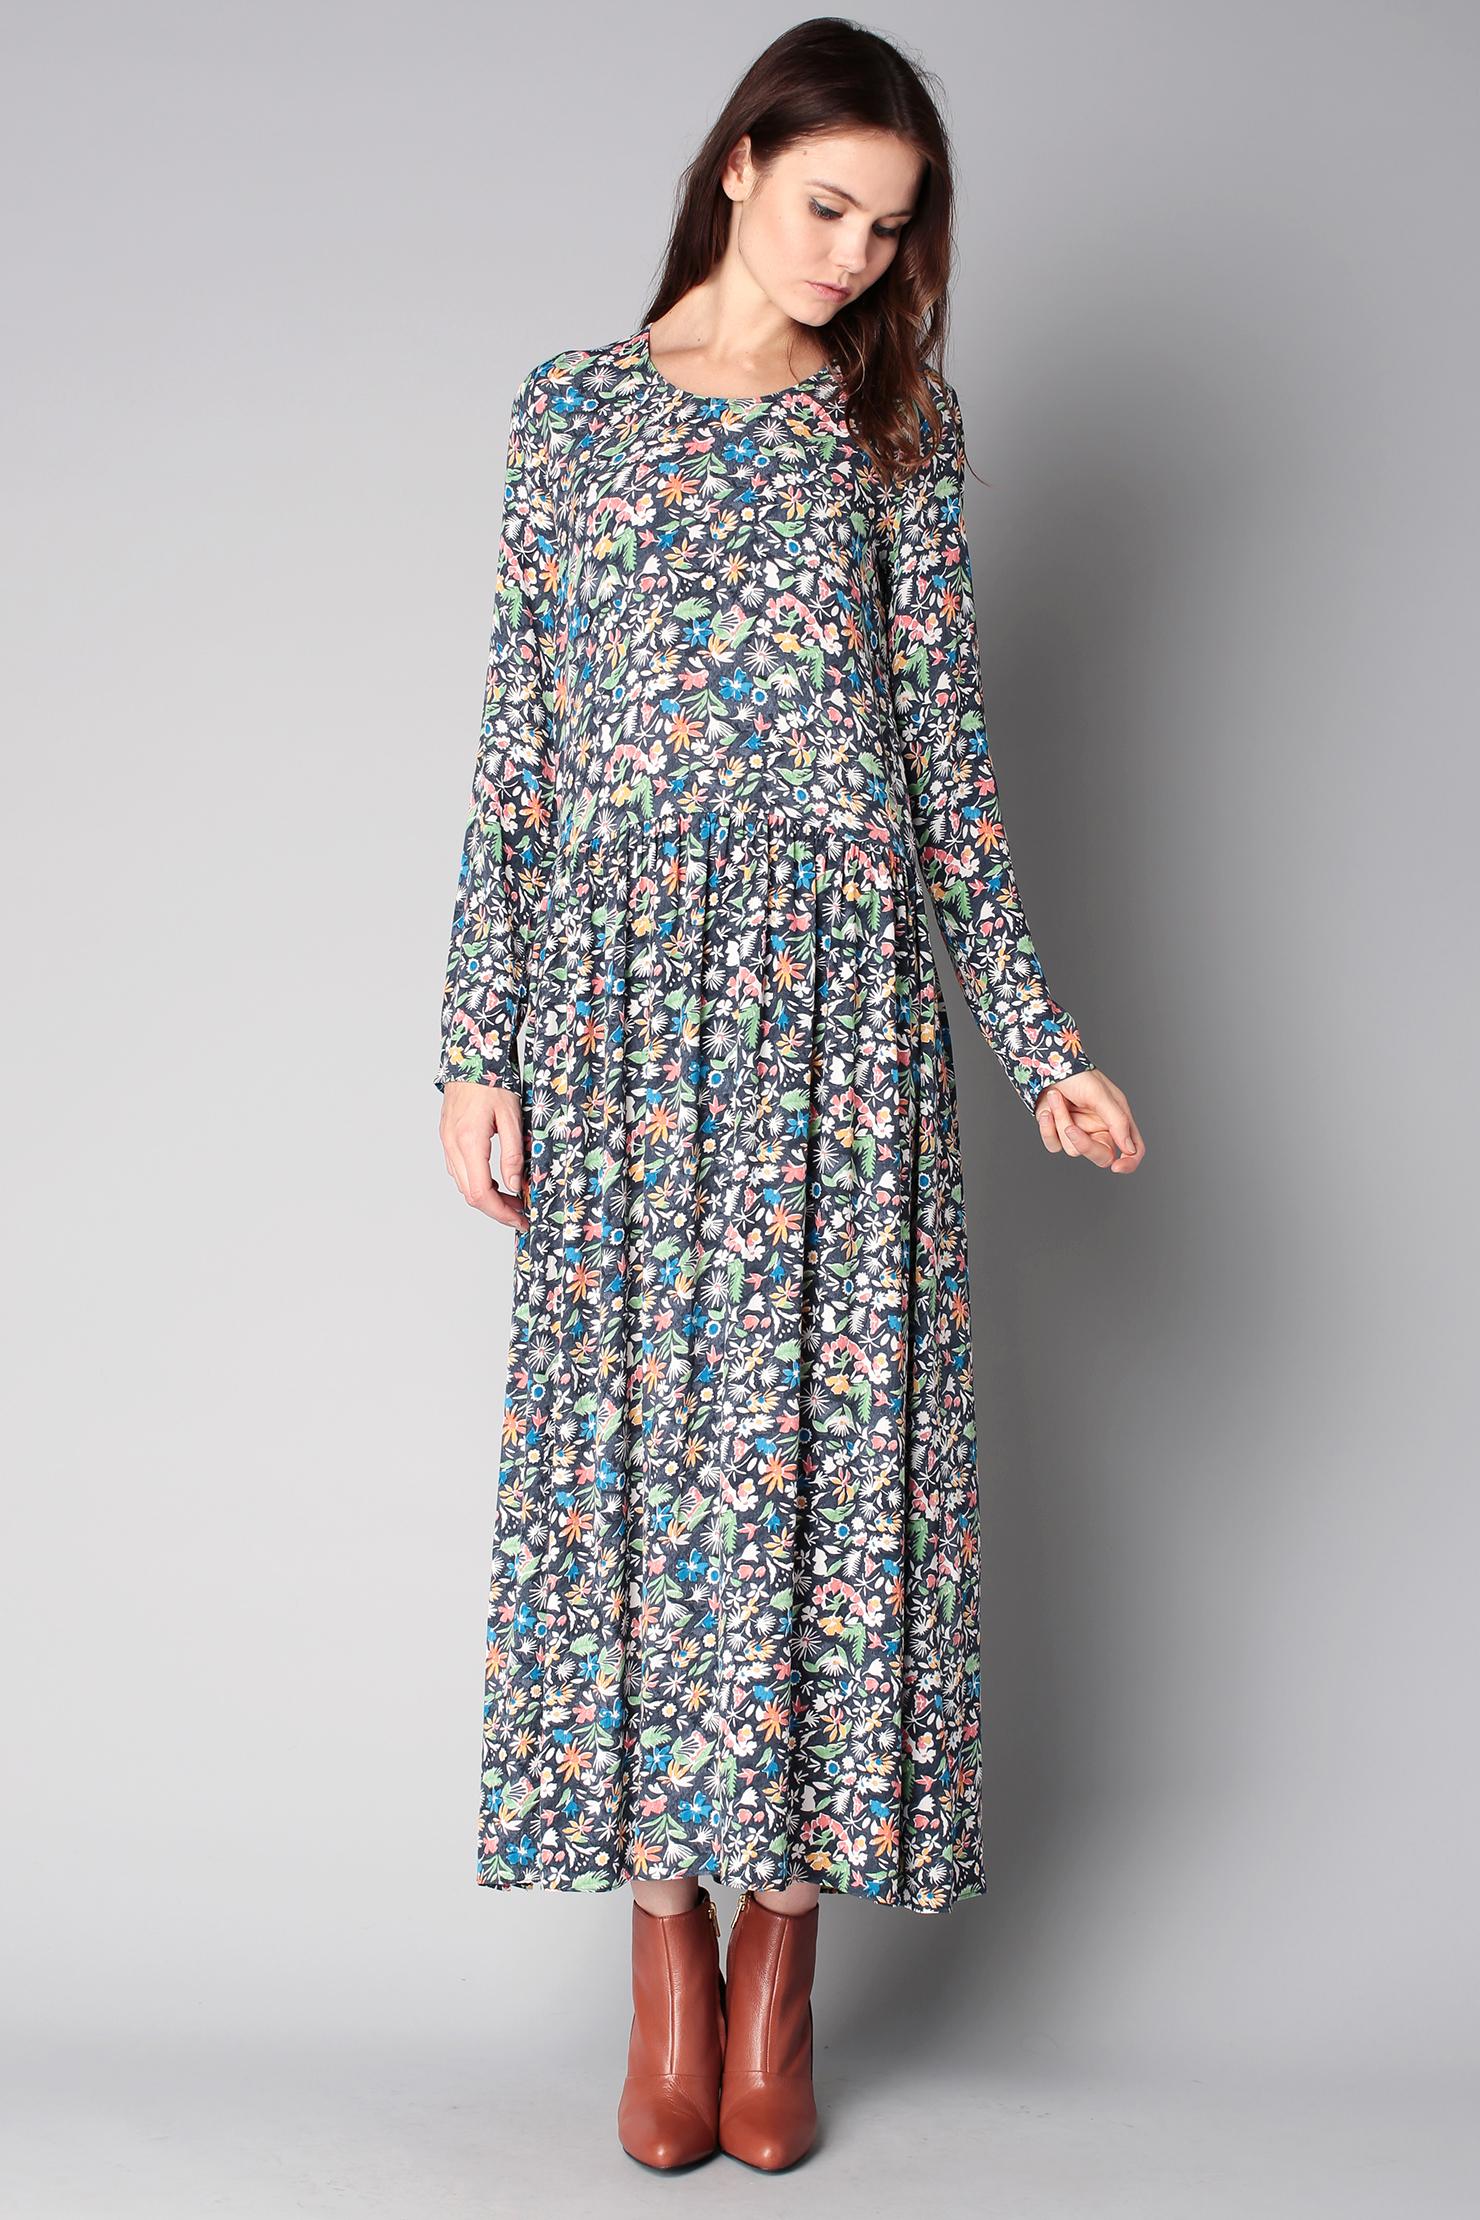 American vintage maxi dress